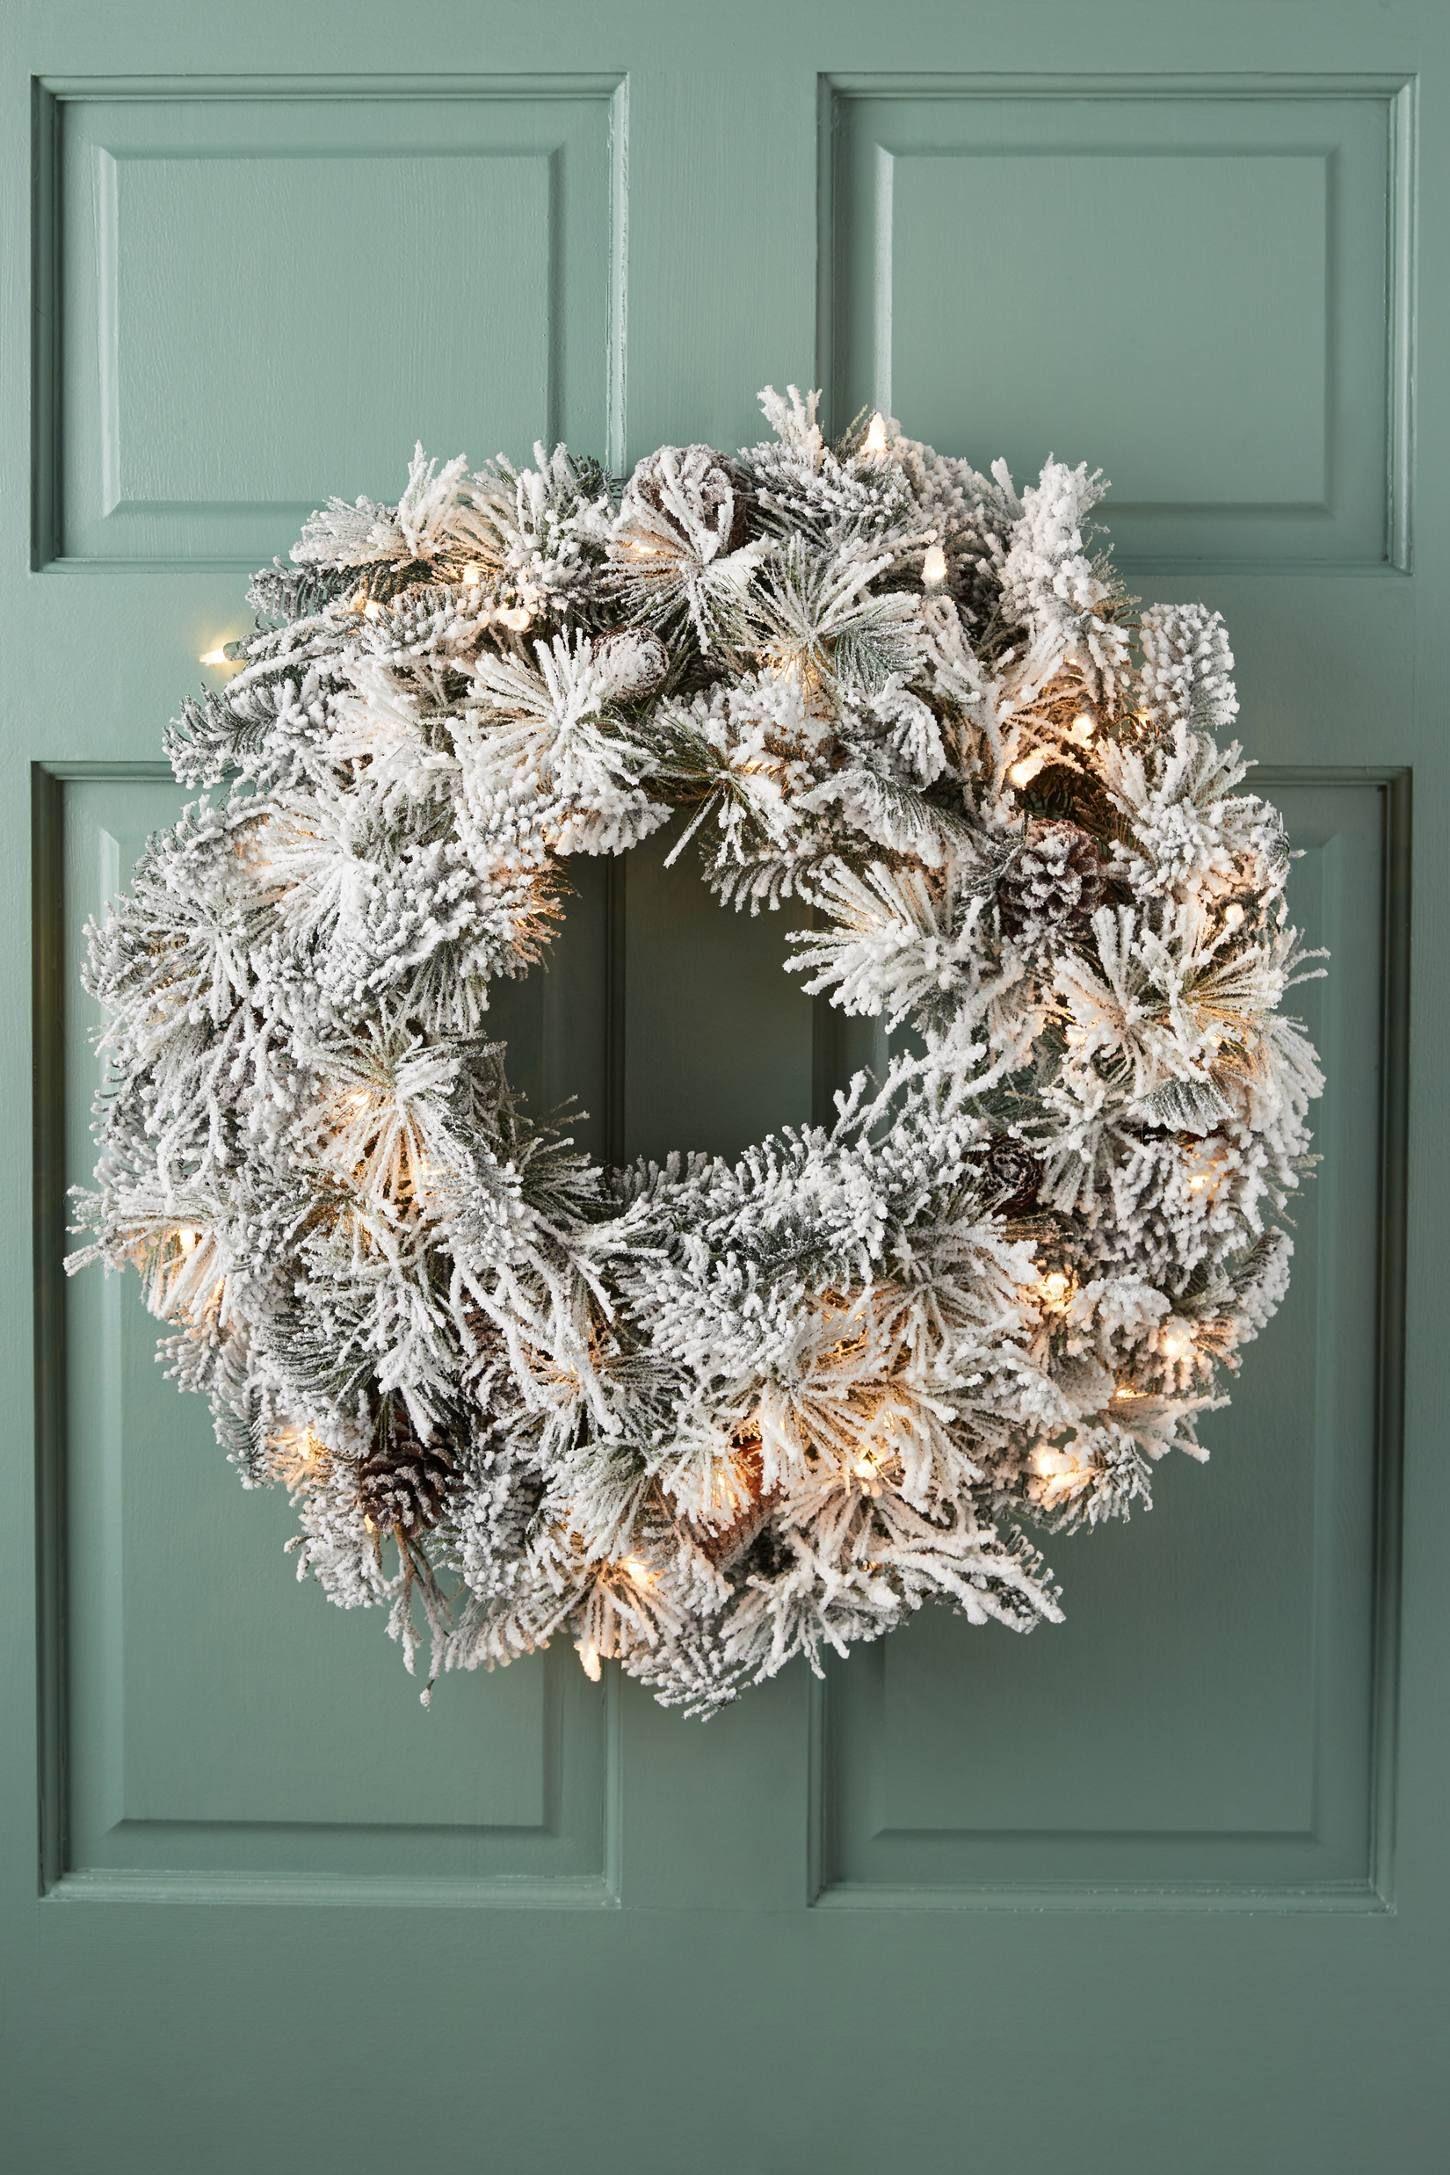 Anthropologie. Snowy Pine Wreath